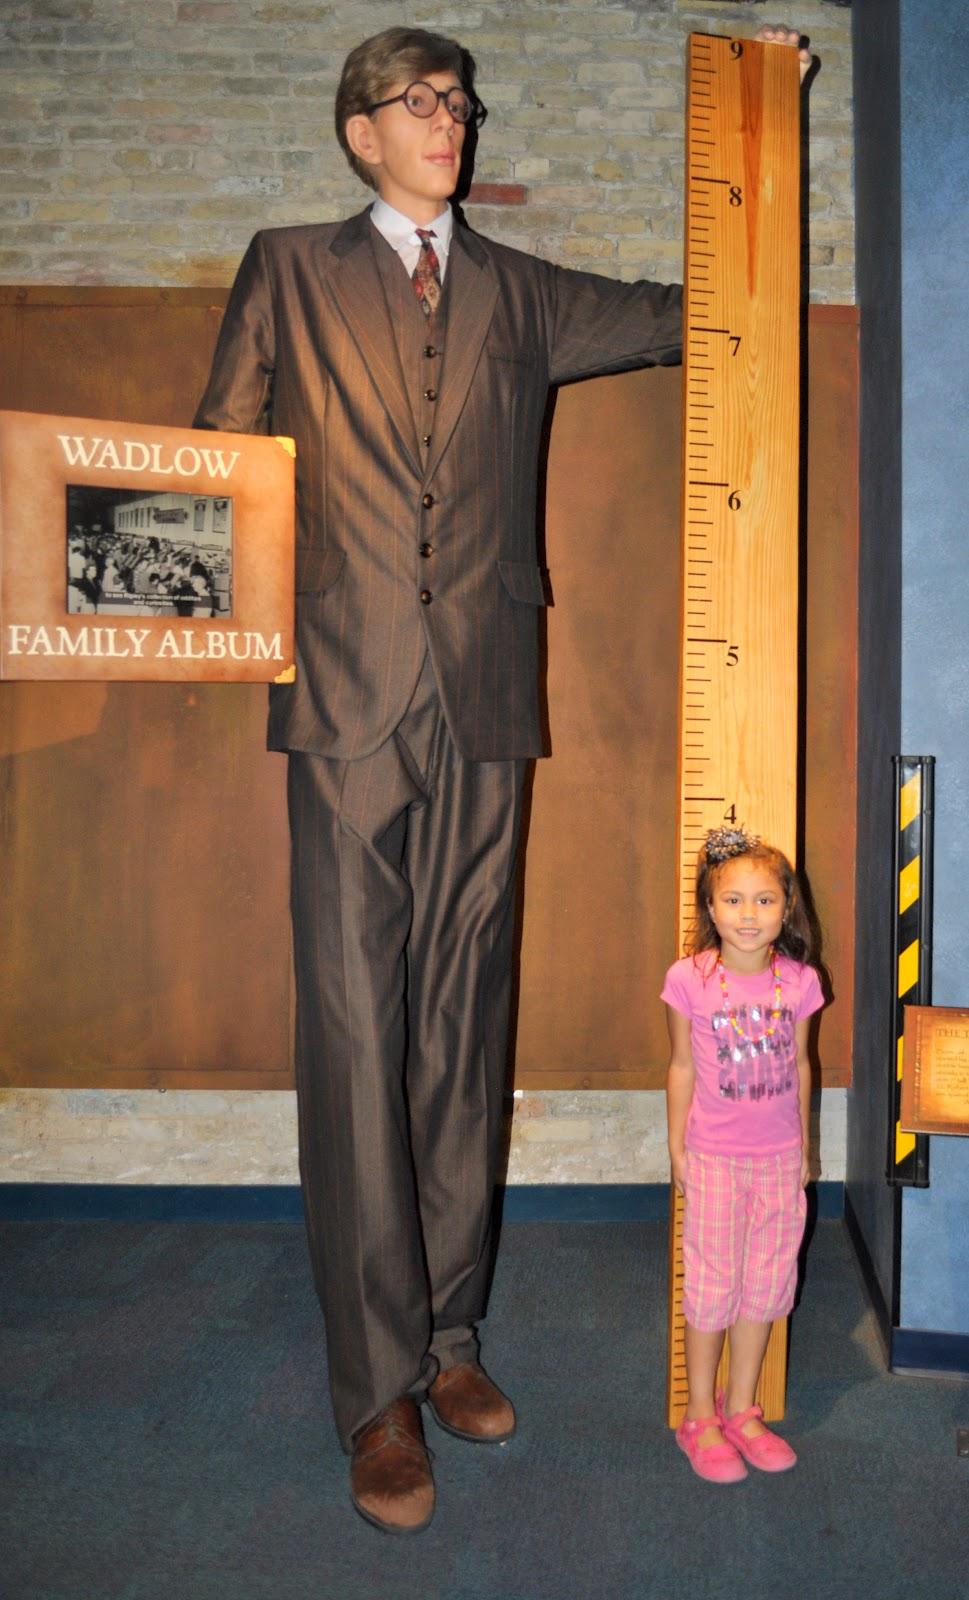 Robert Wadlow ~ The Dias Family Adventures